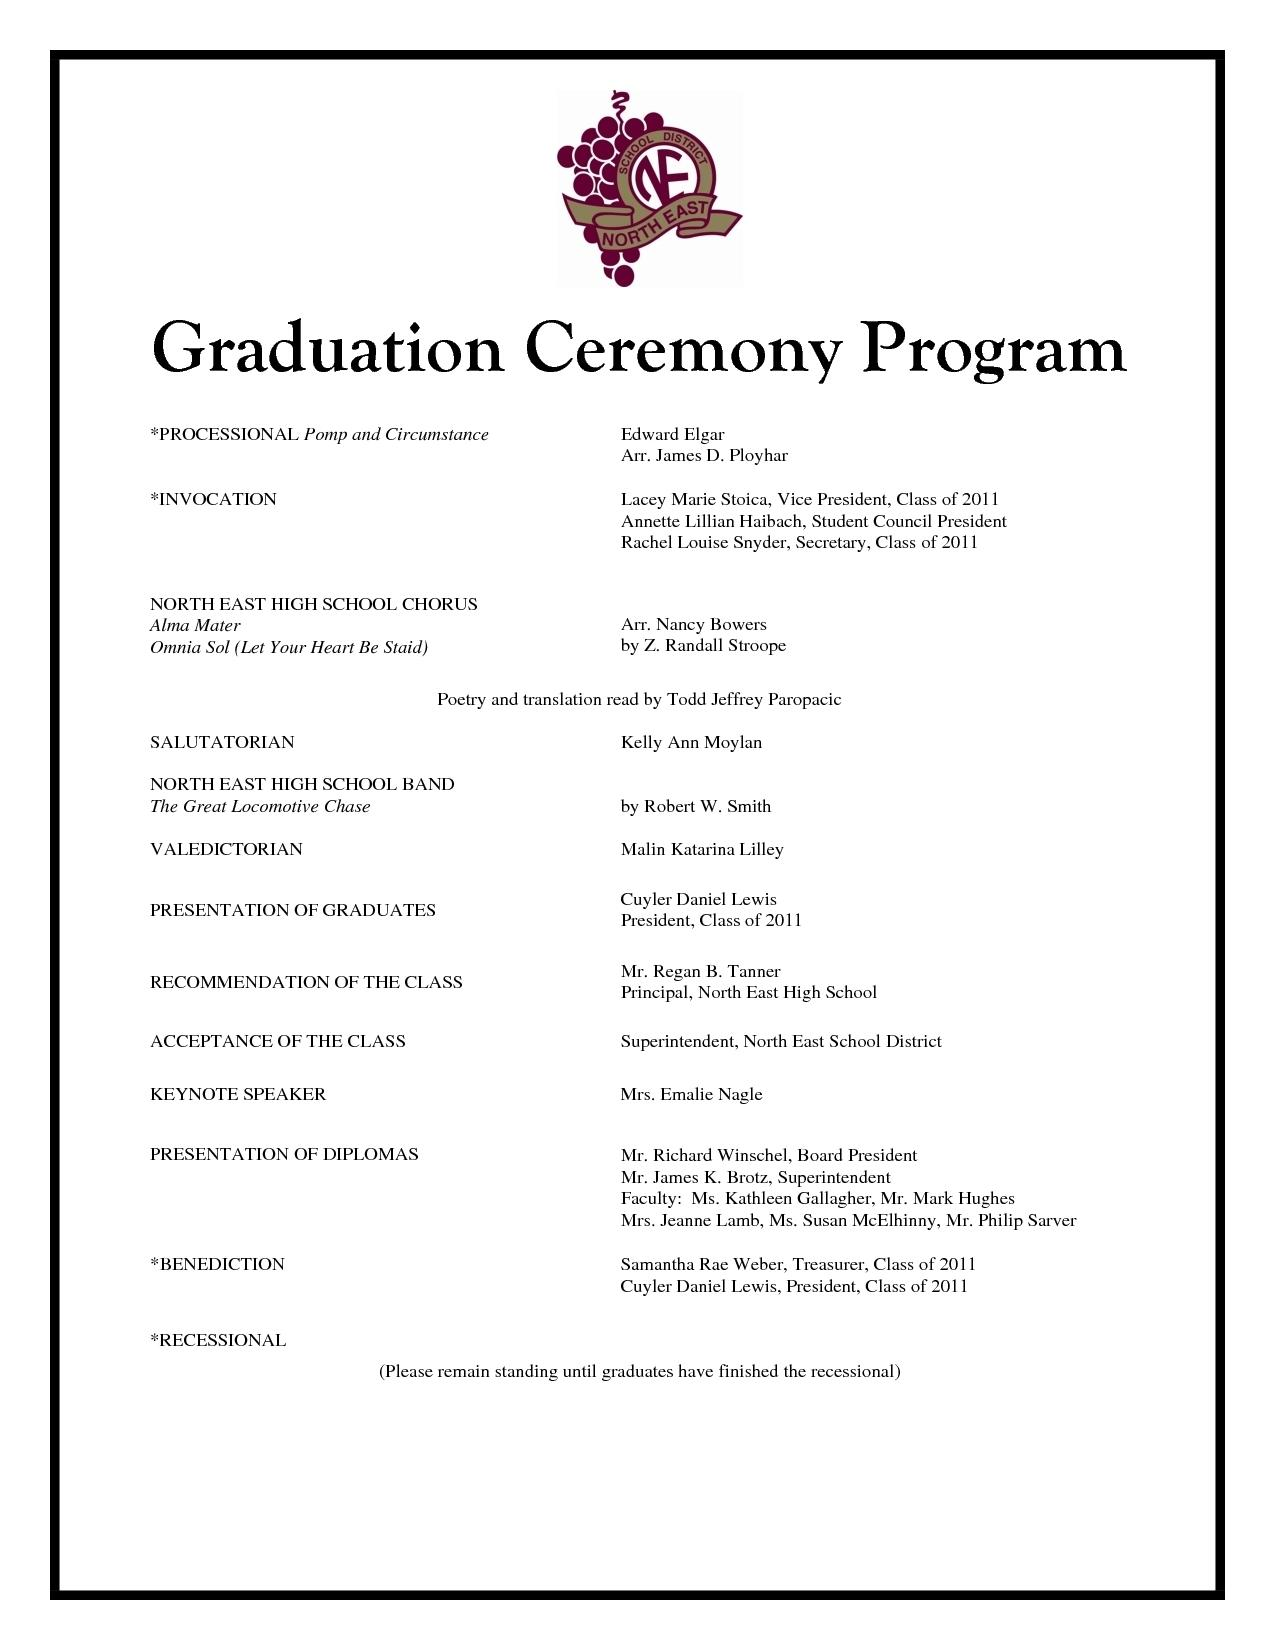 Graduation Ceremony Program Templates